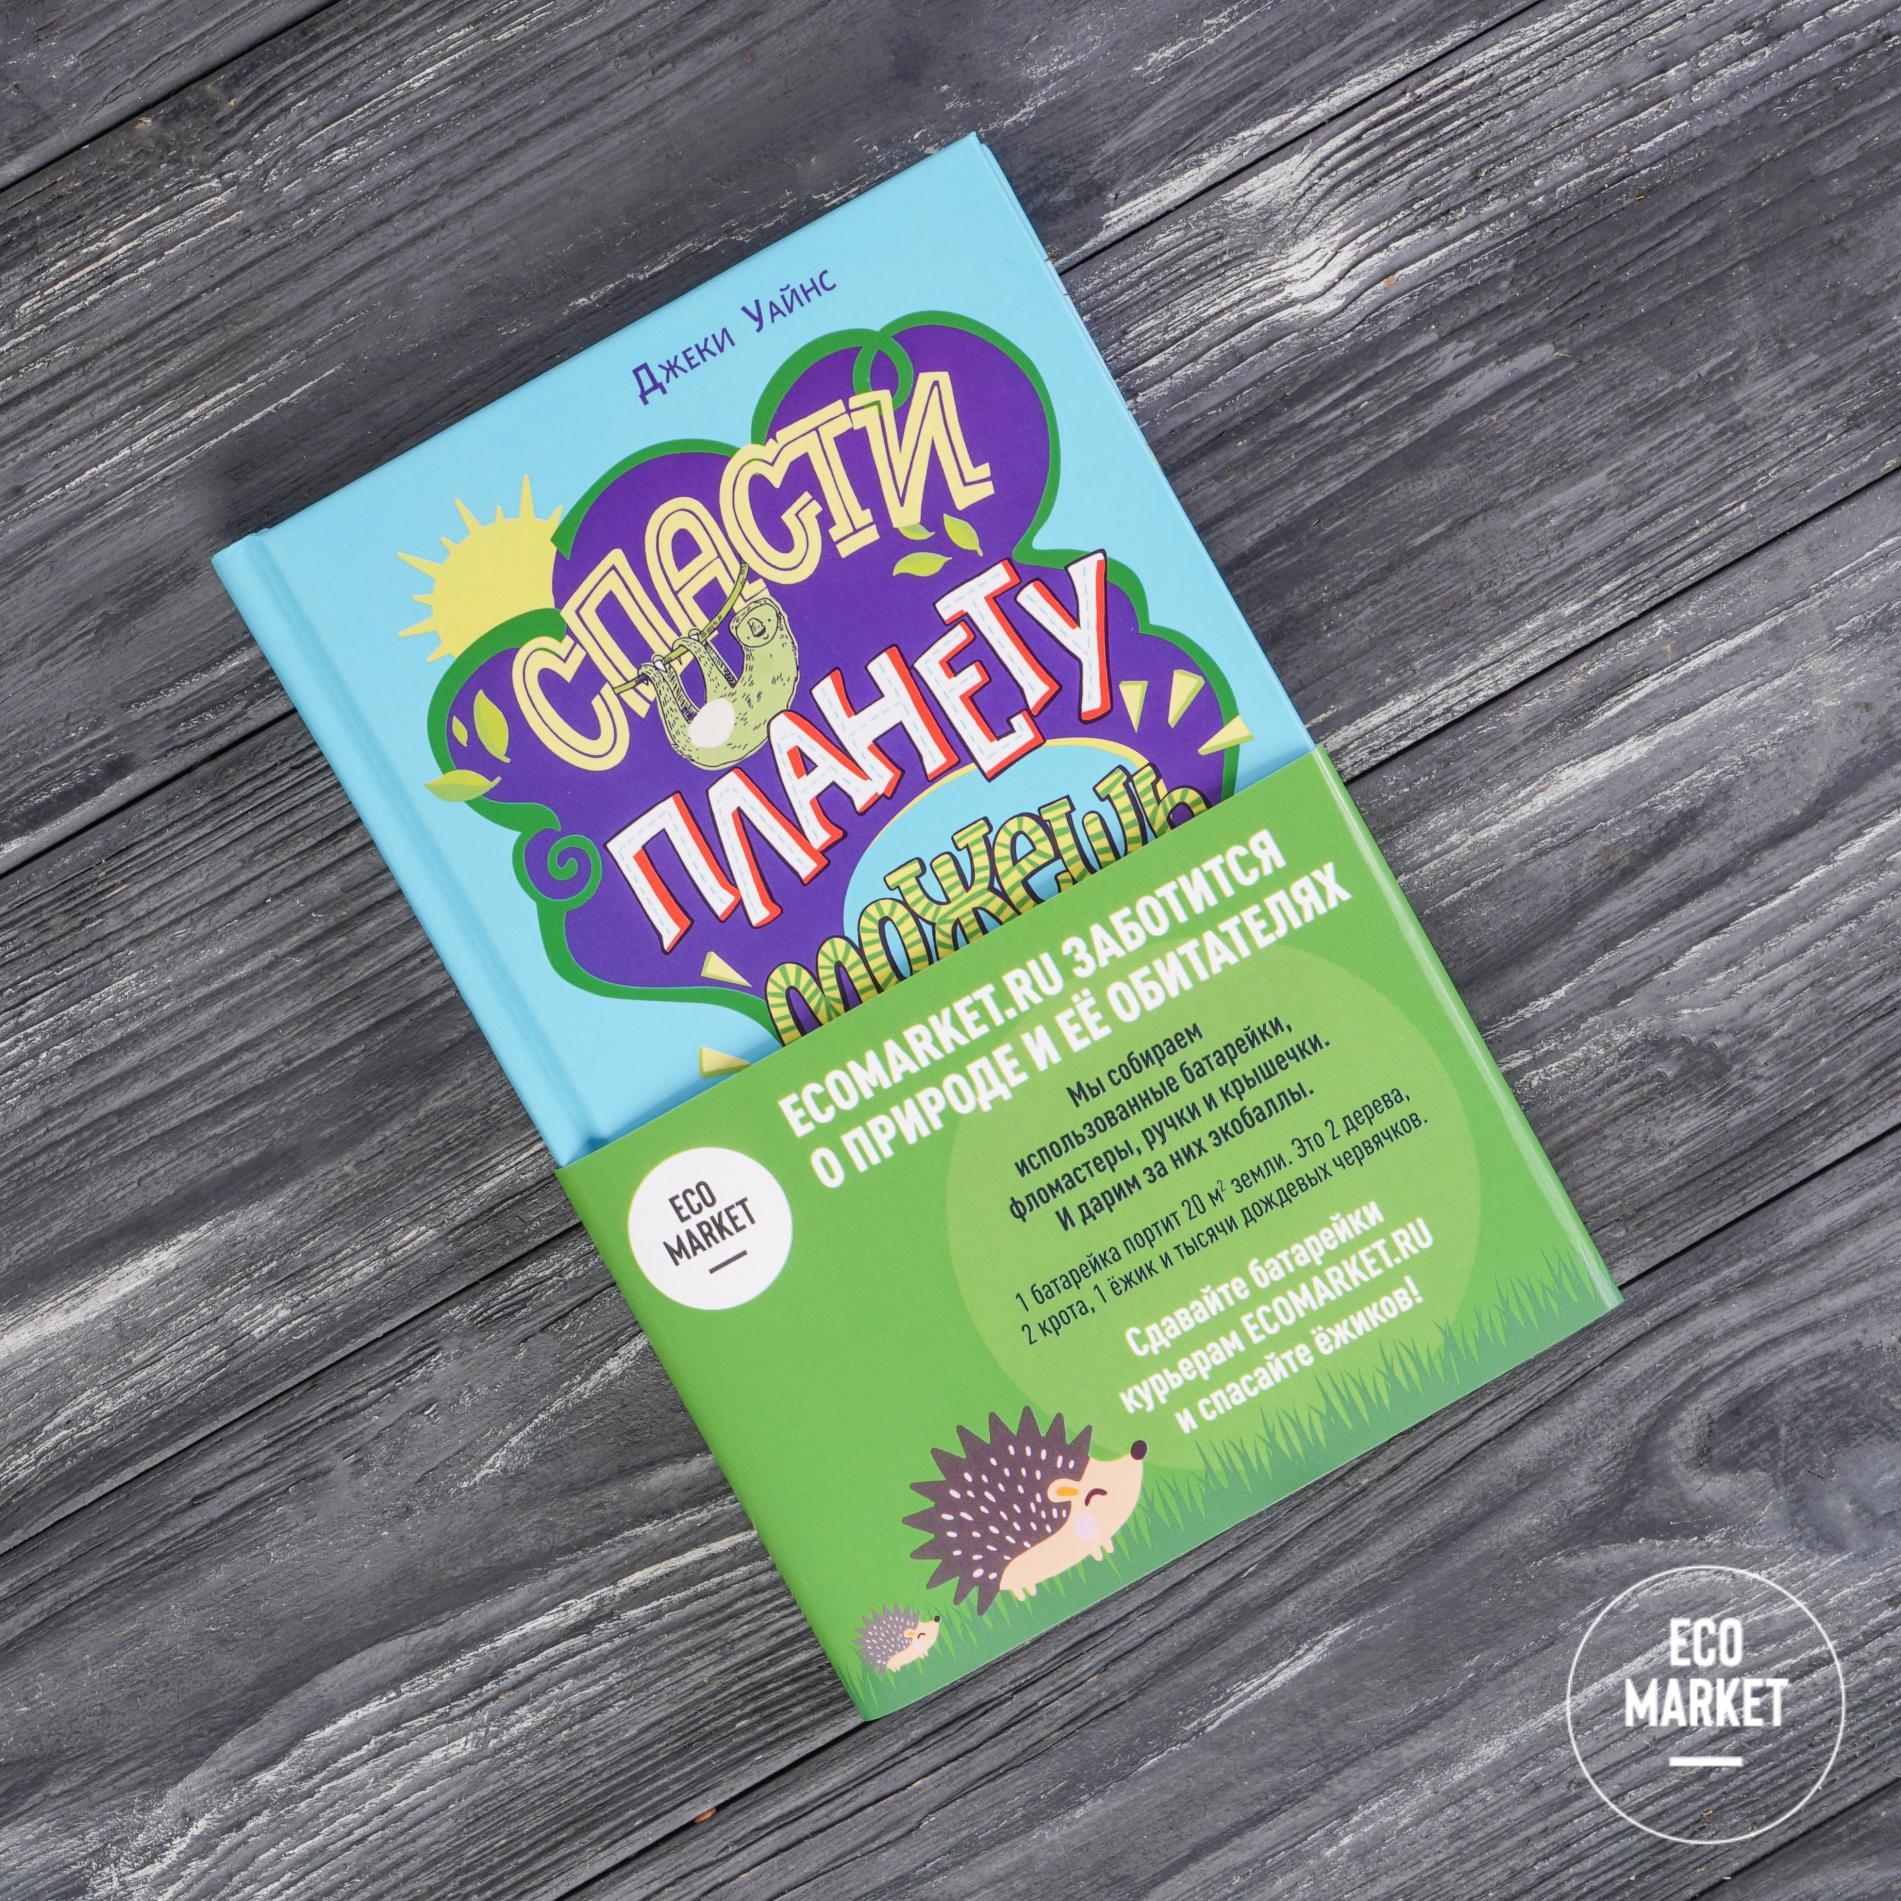 Книга Спасти планету можешь ты, Джеки Уайнс Ecomarket.ru